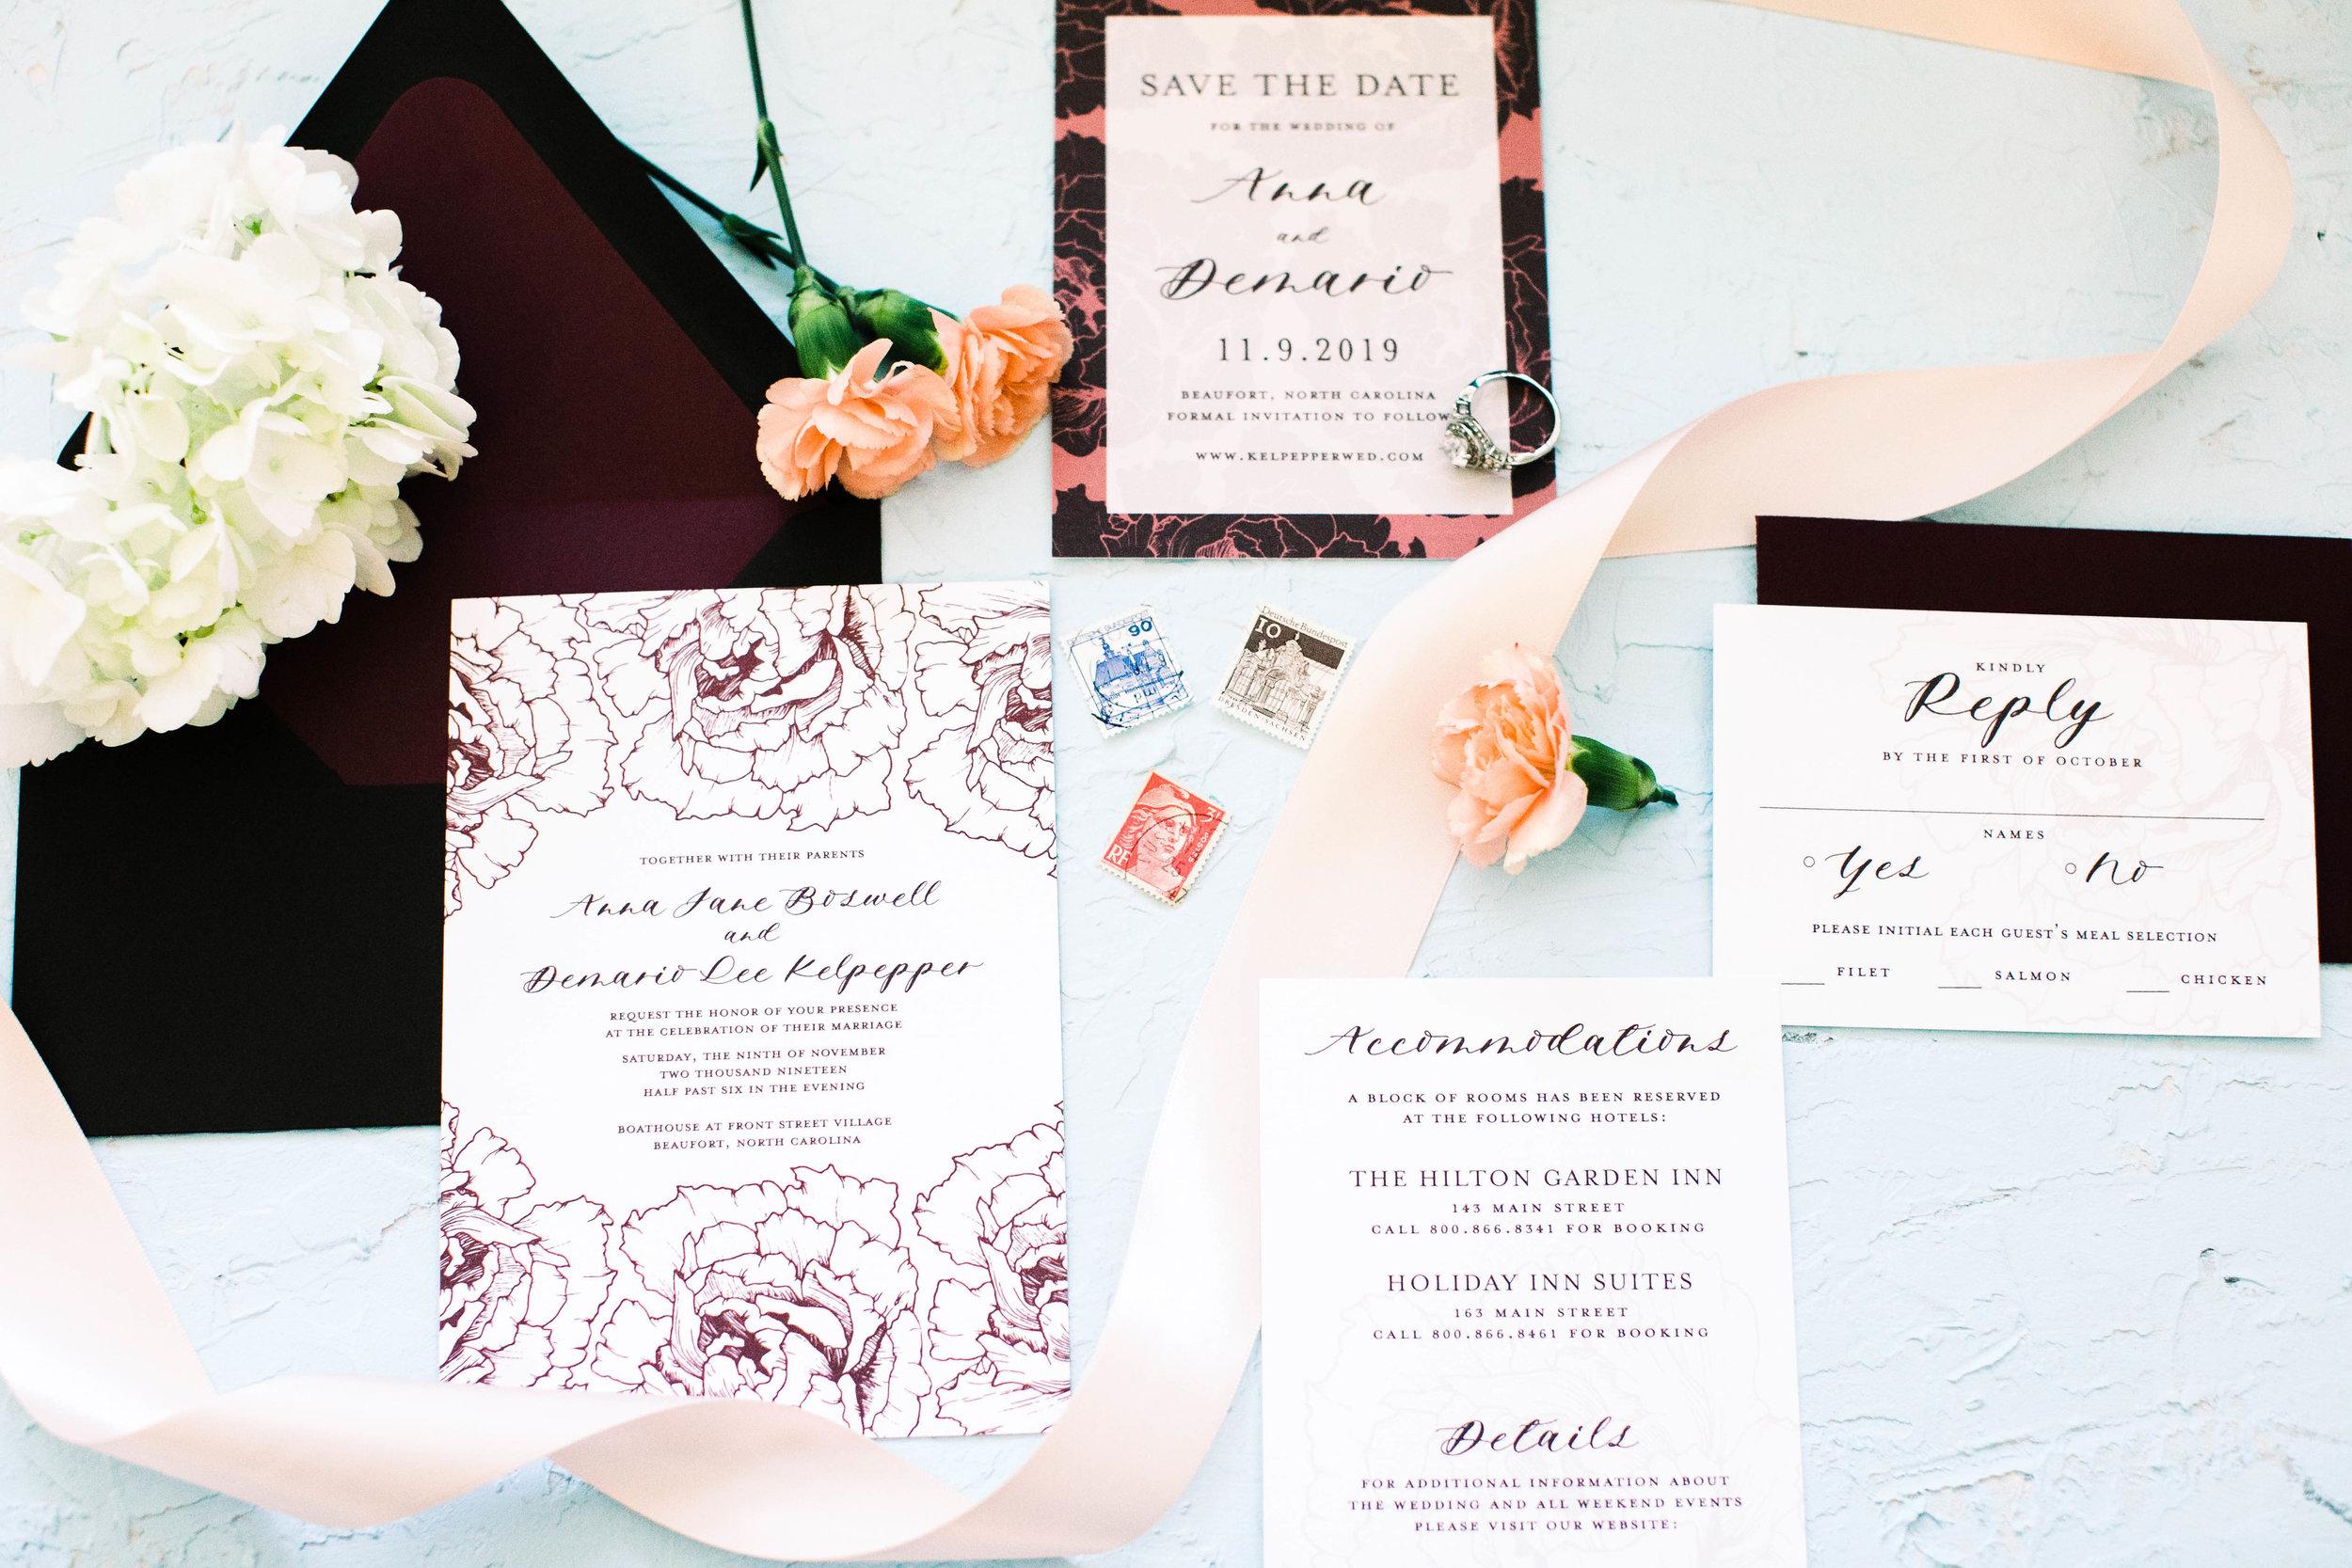 Anna Hand Drawn Wedding Invitation Burgundy Peonies Feathered Heart Prints3W2A0362.jpg